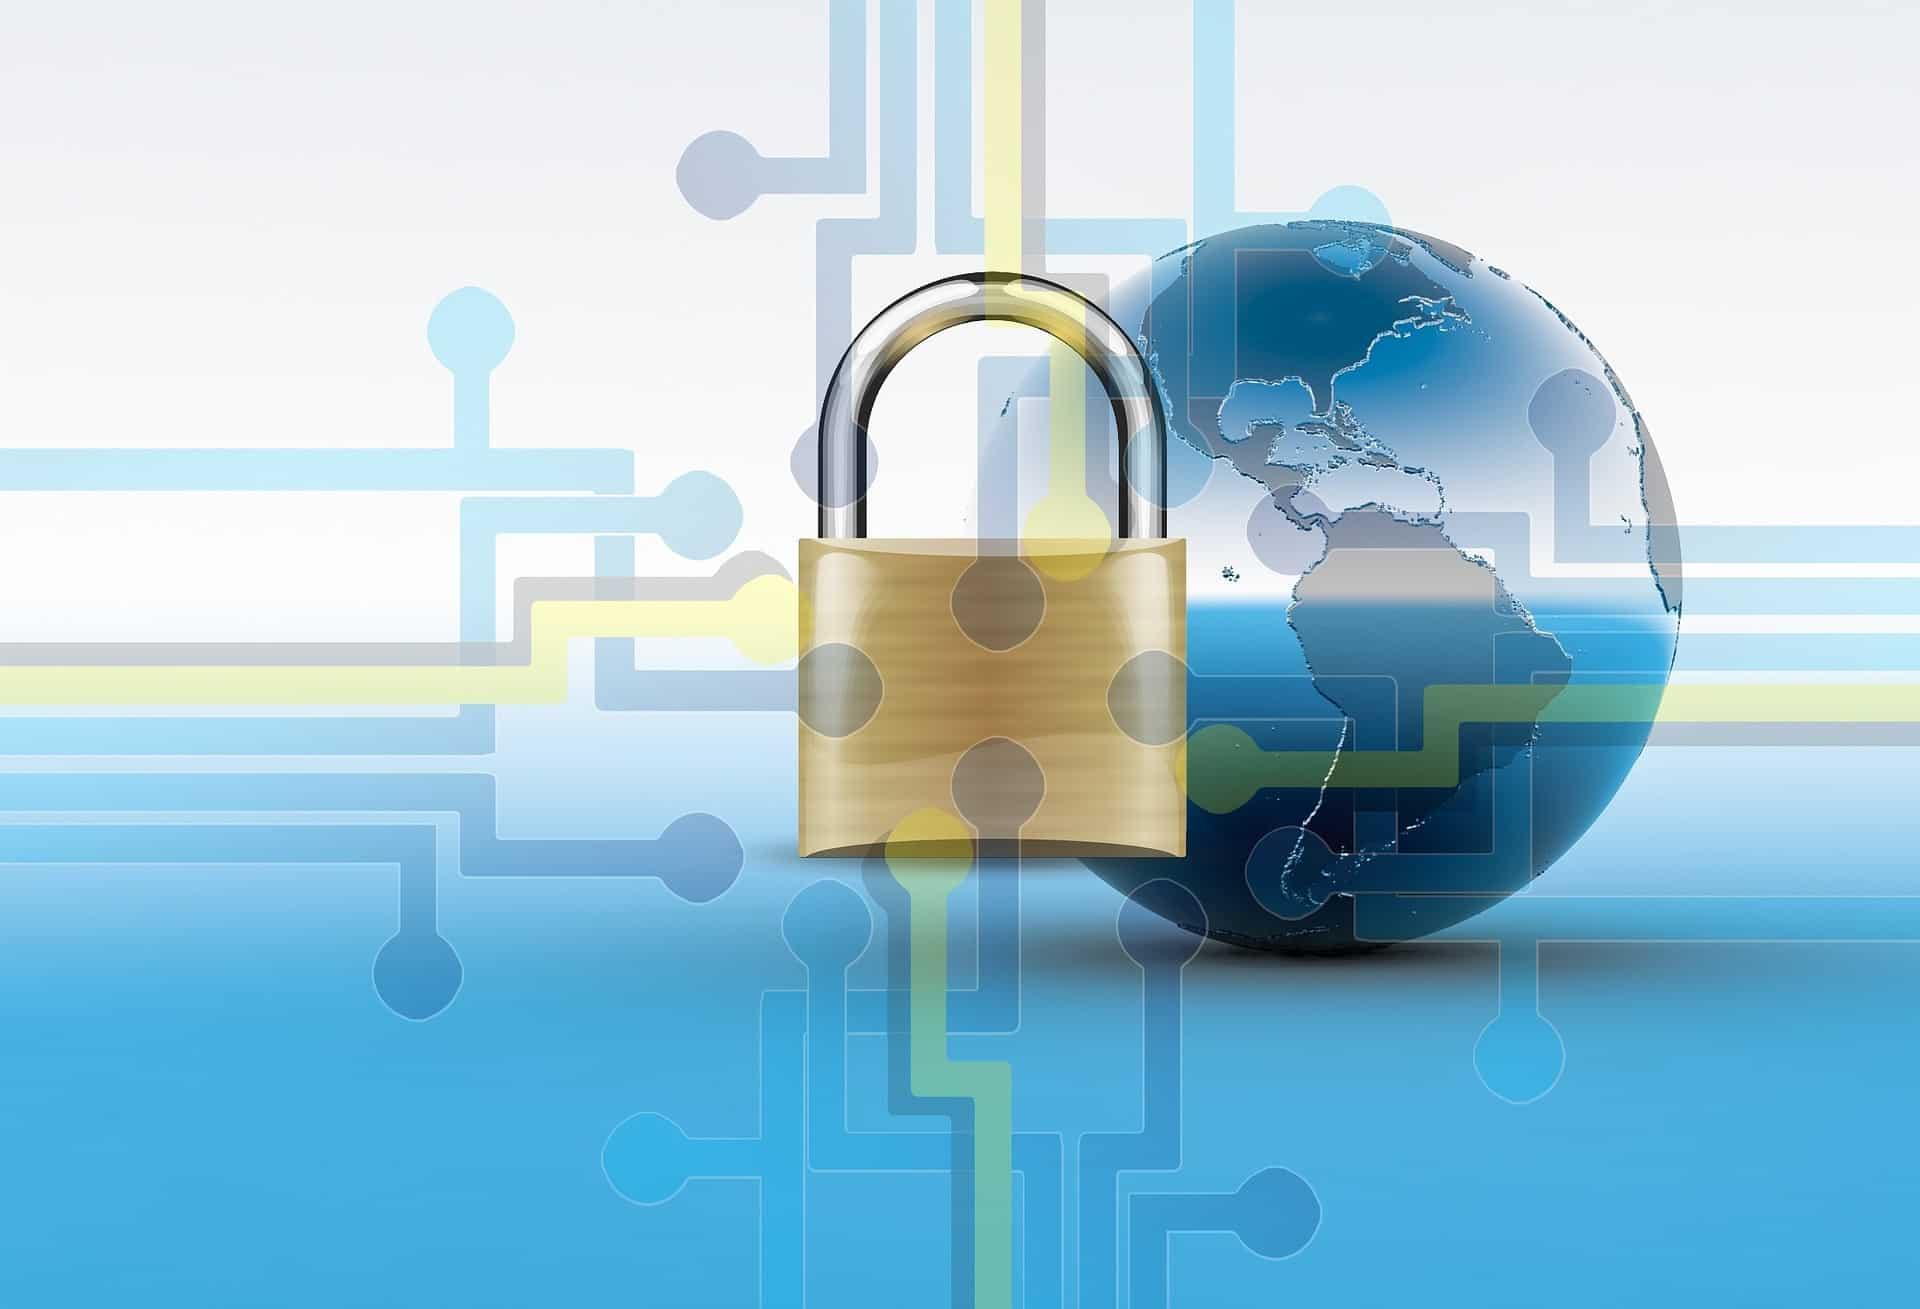 public key کلید عمومی